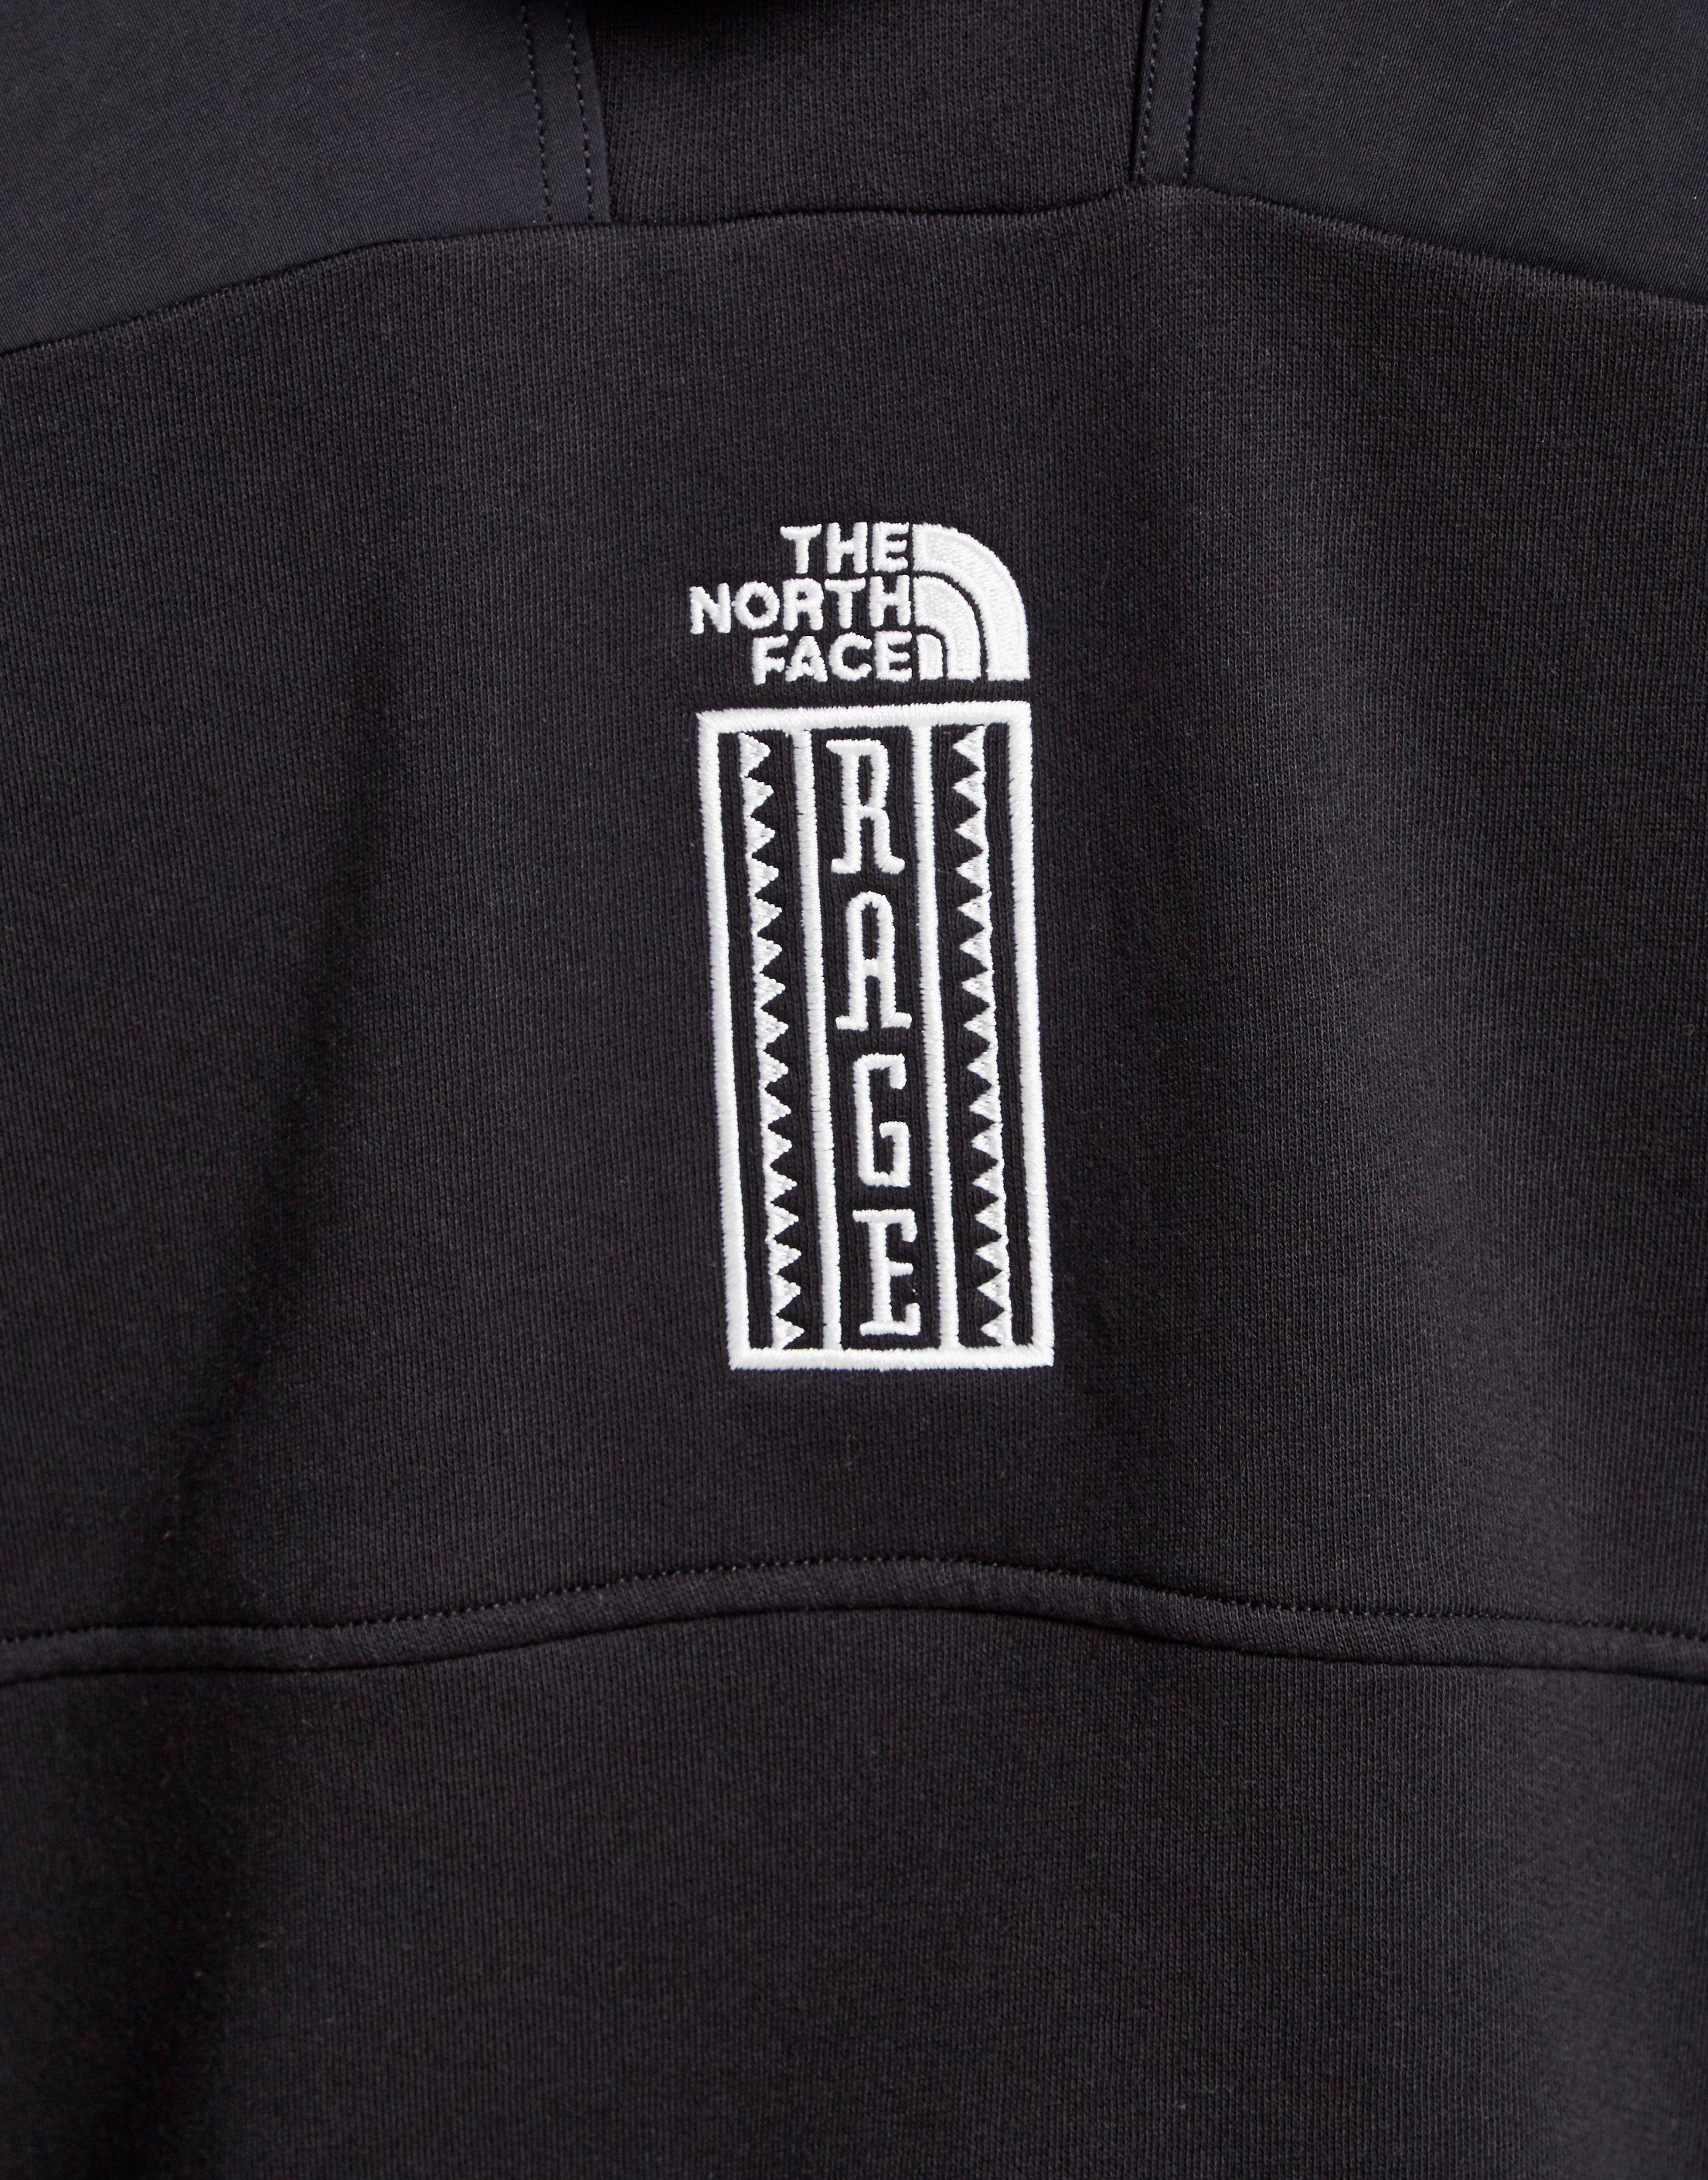 The North Face Rage '92 Fleece Hoodie